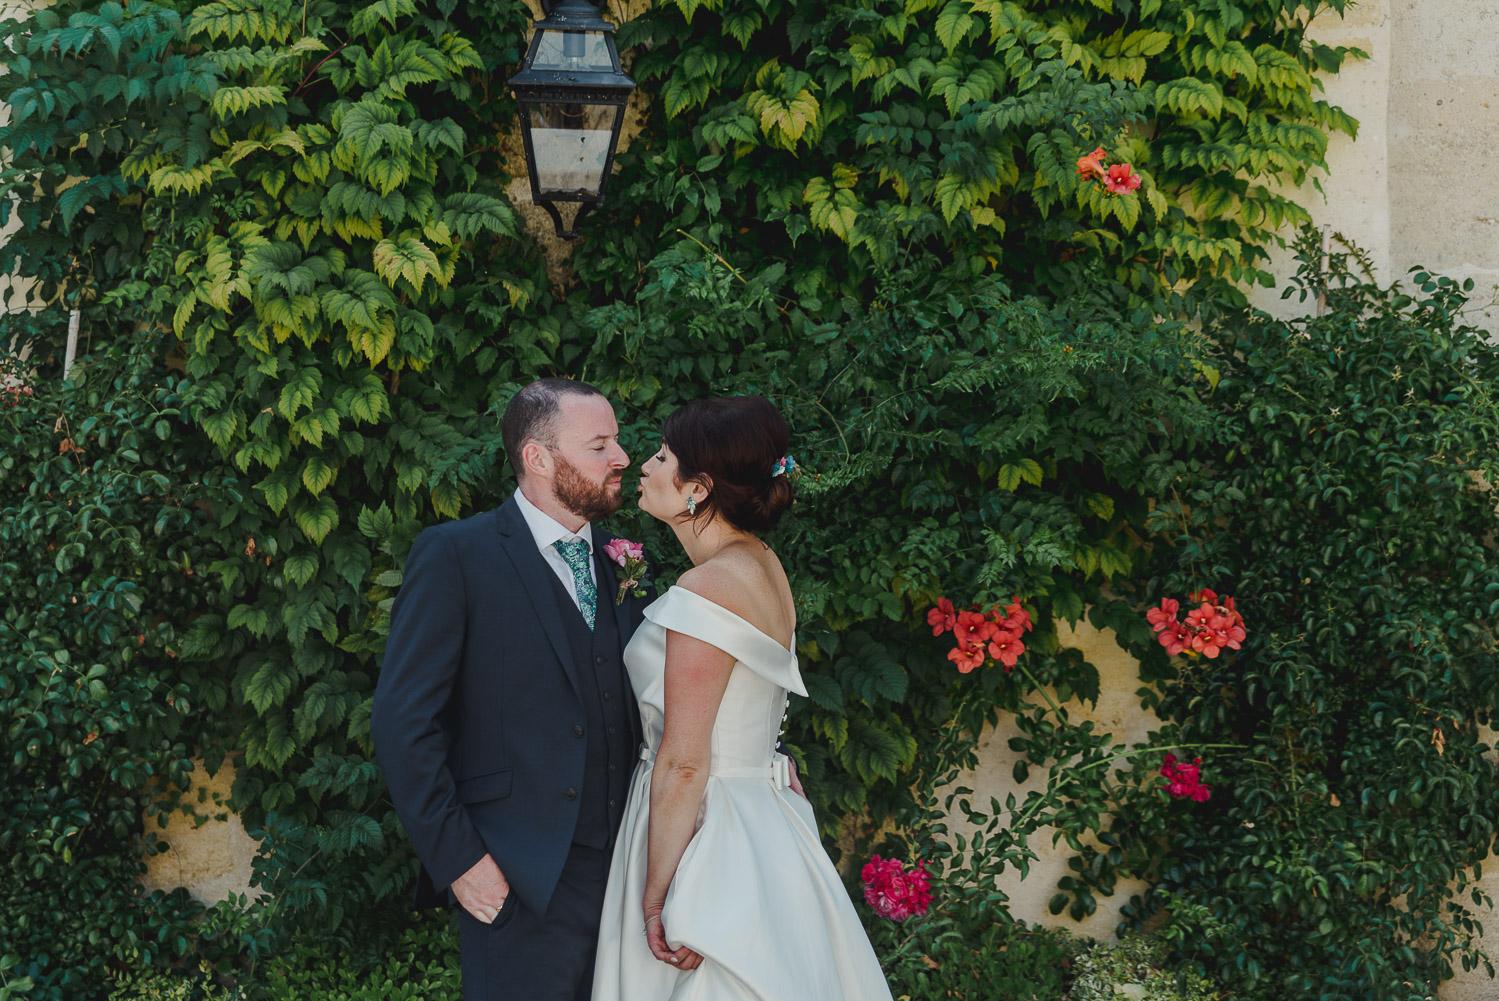 gascony_bordeaux_south_west_france_wedding_tarn_katy_webb_photography_UK83